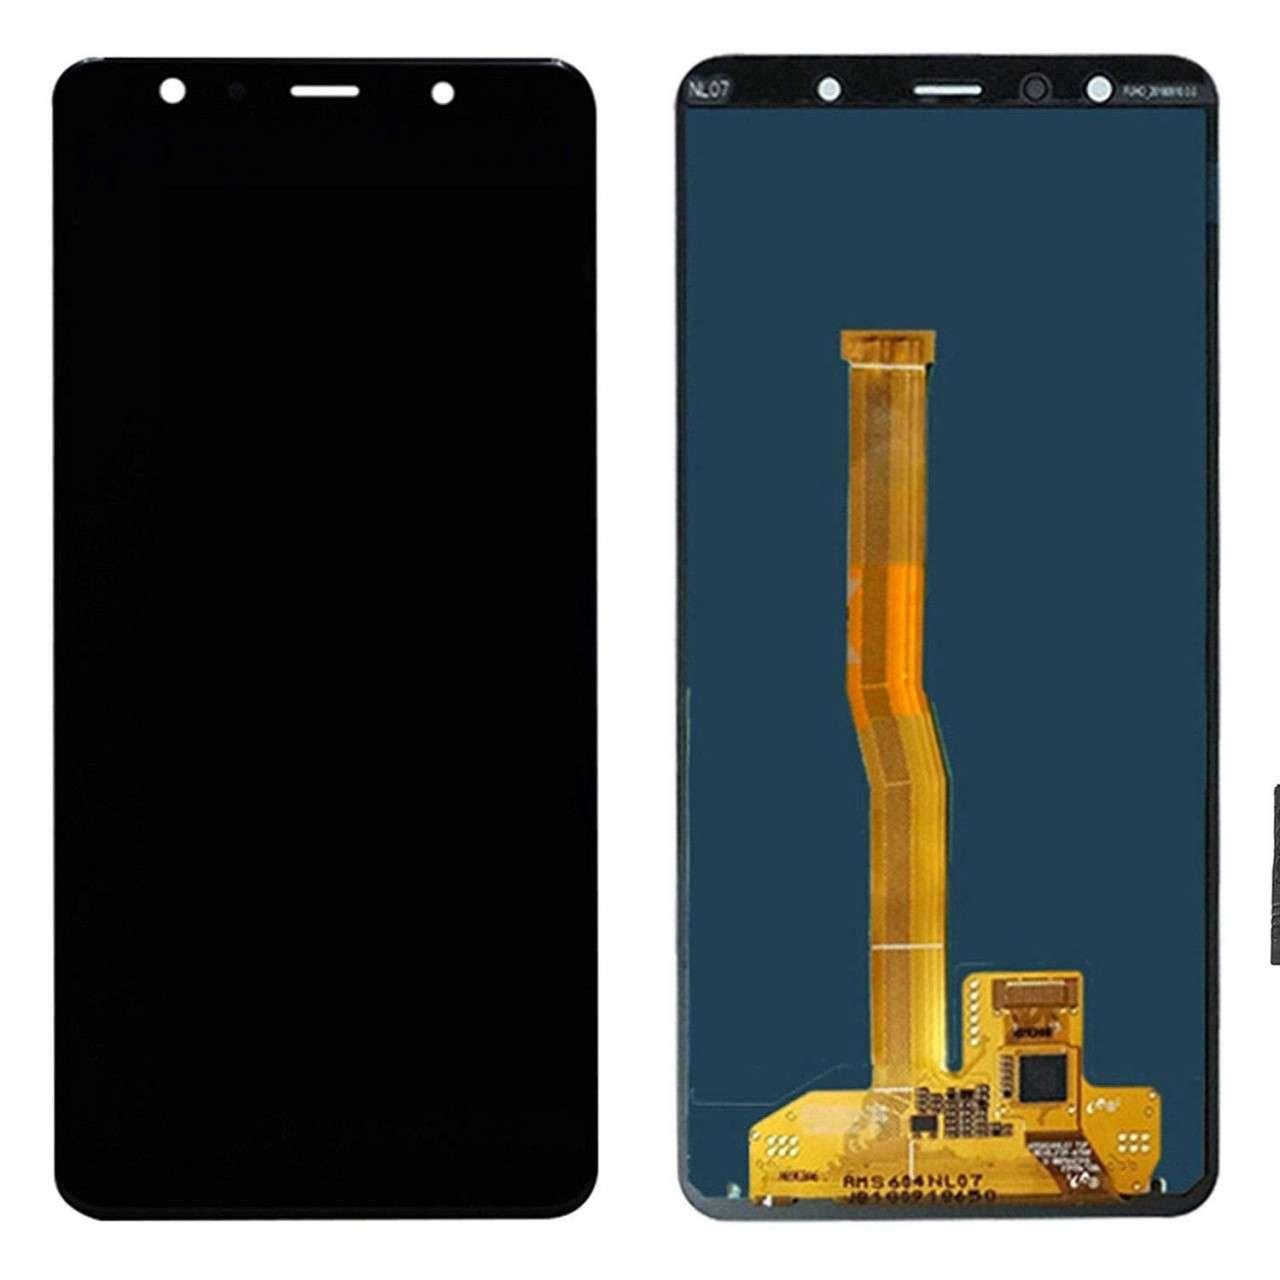 Display Samsung Galaxy A7 2018 A750 Display TFT LCD Black Negru imagine powerlaptop.ro 2021